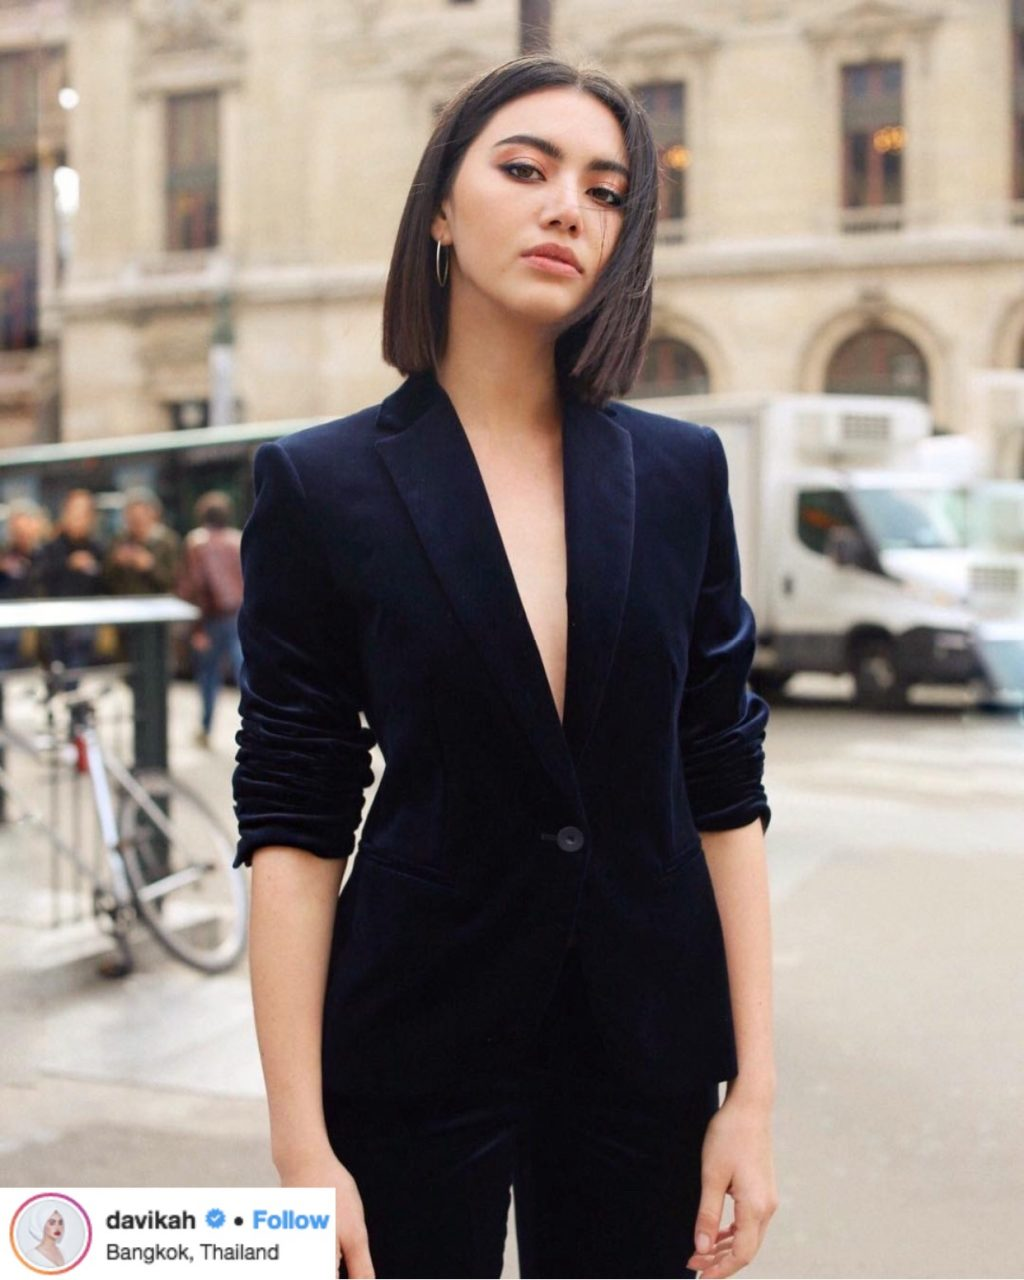 elle việt nam fashionista Thái 13